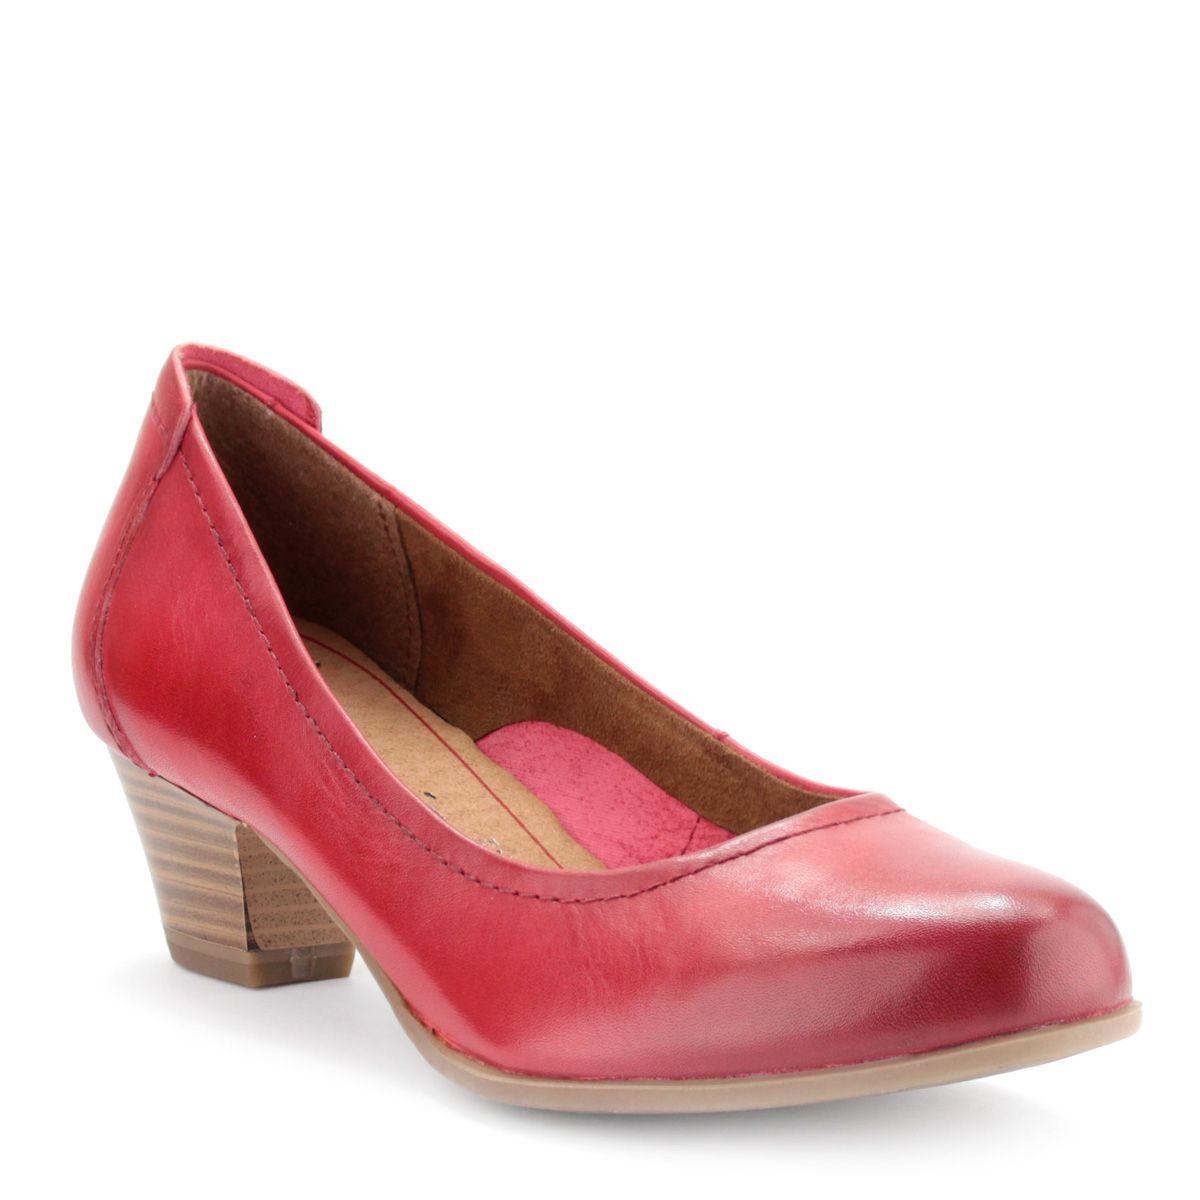 Piros Tamaris cipő ANTiShokk sarokkal  efa5a0bdd0